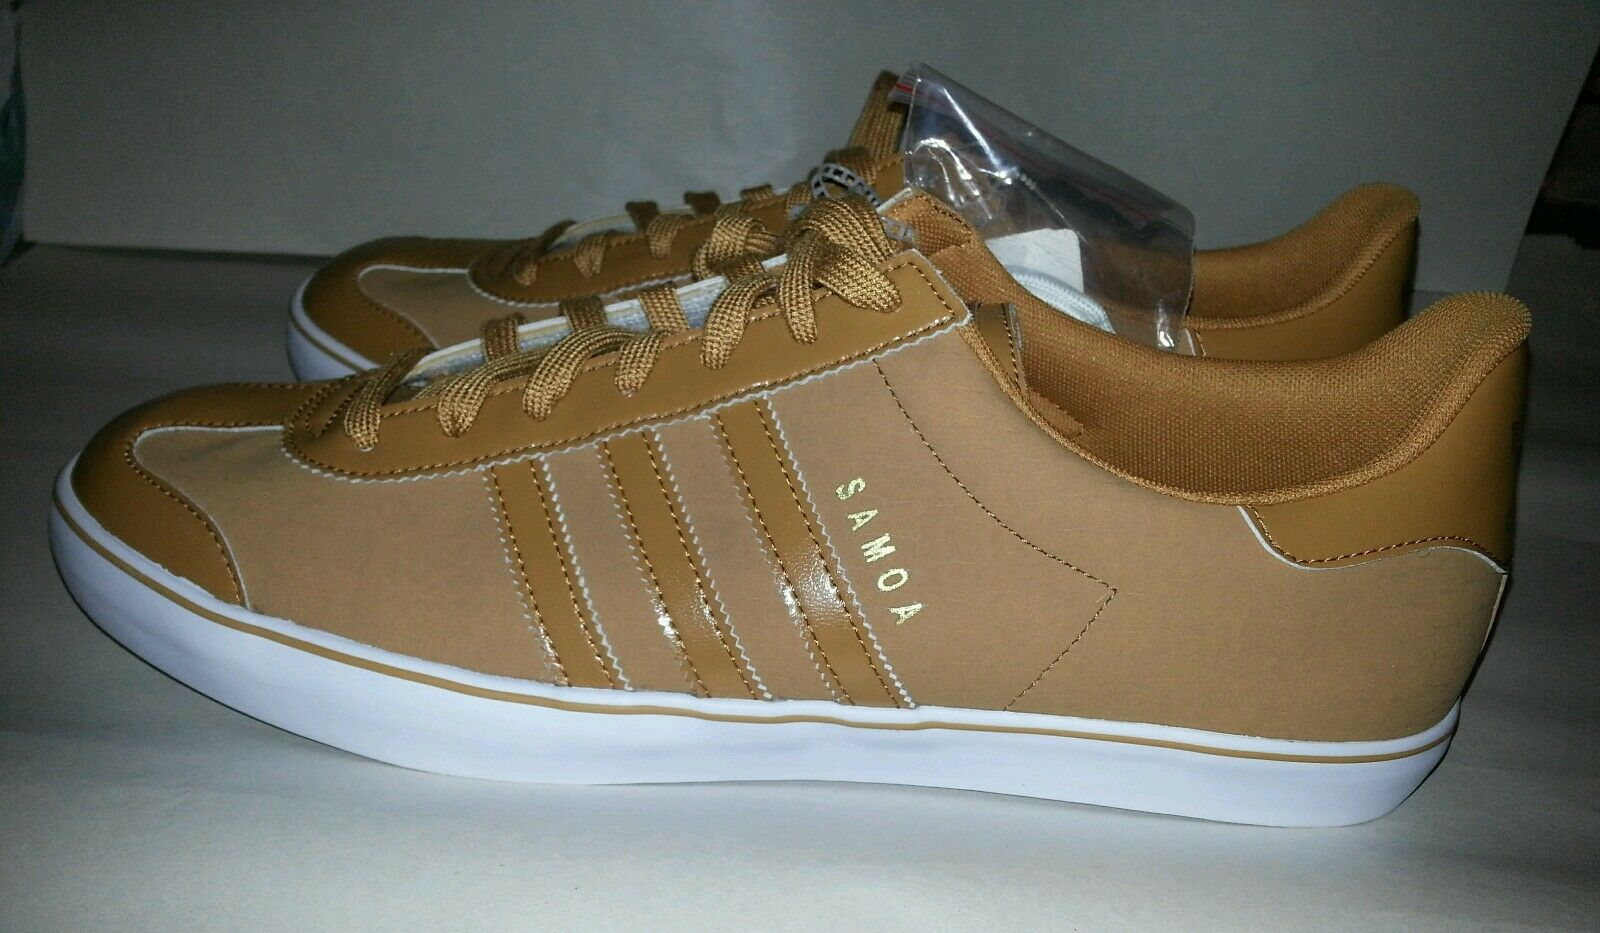 Adidas Originals Samoa Vulc Wheat Men's size 8.5 C76448